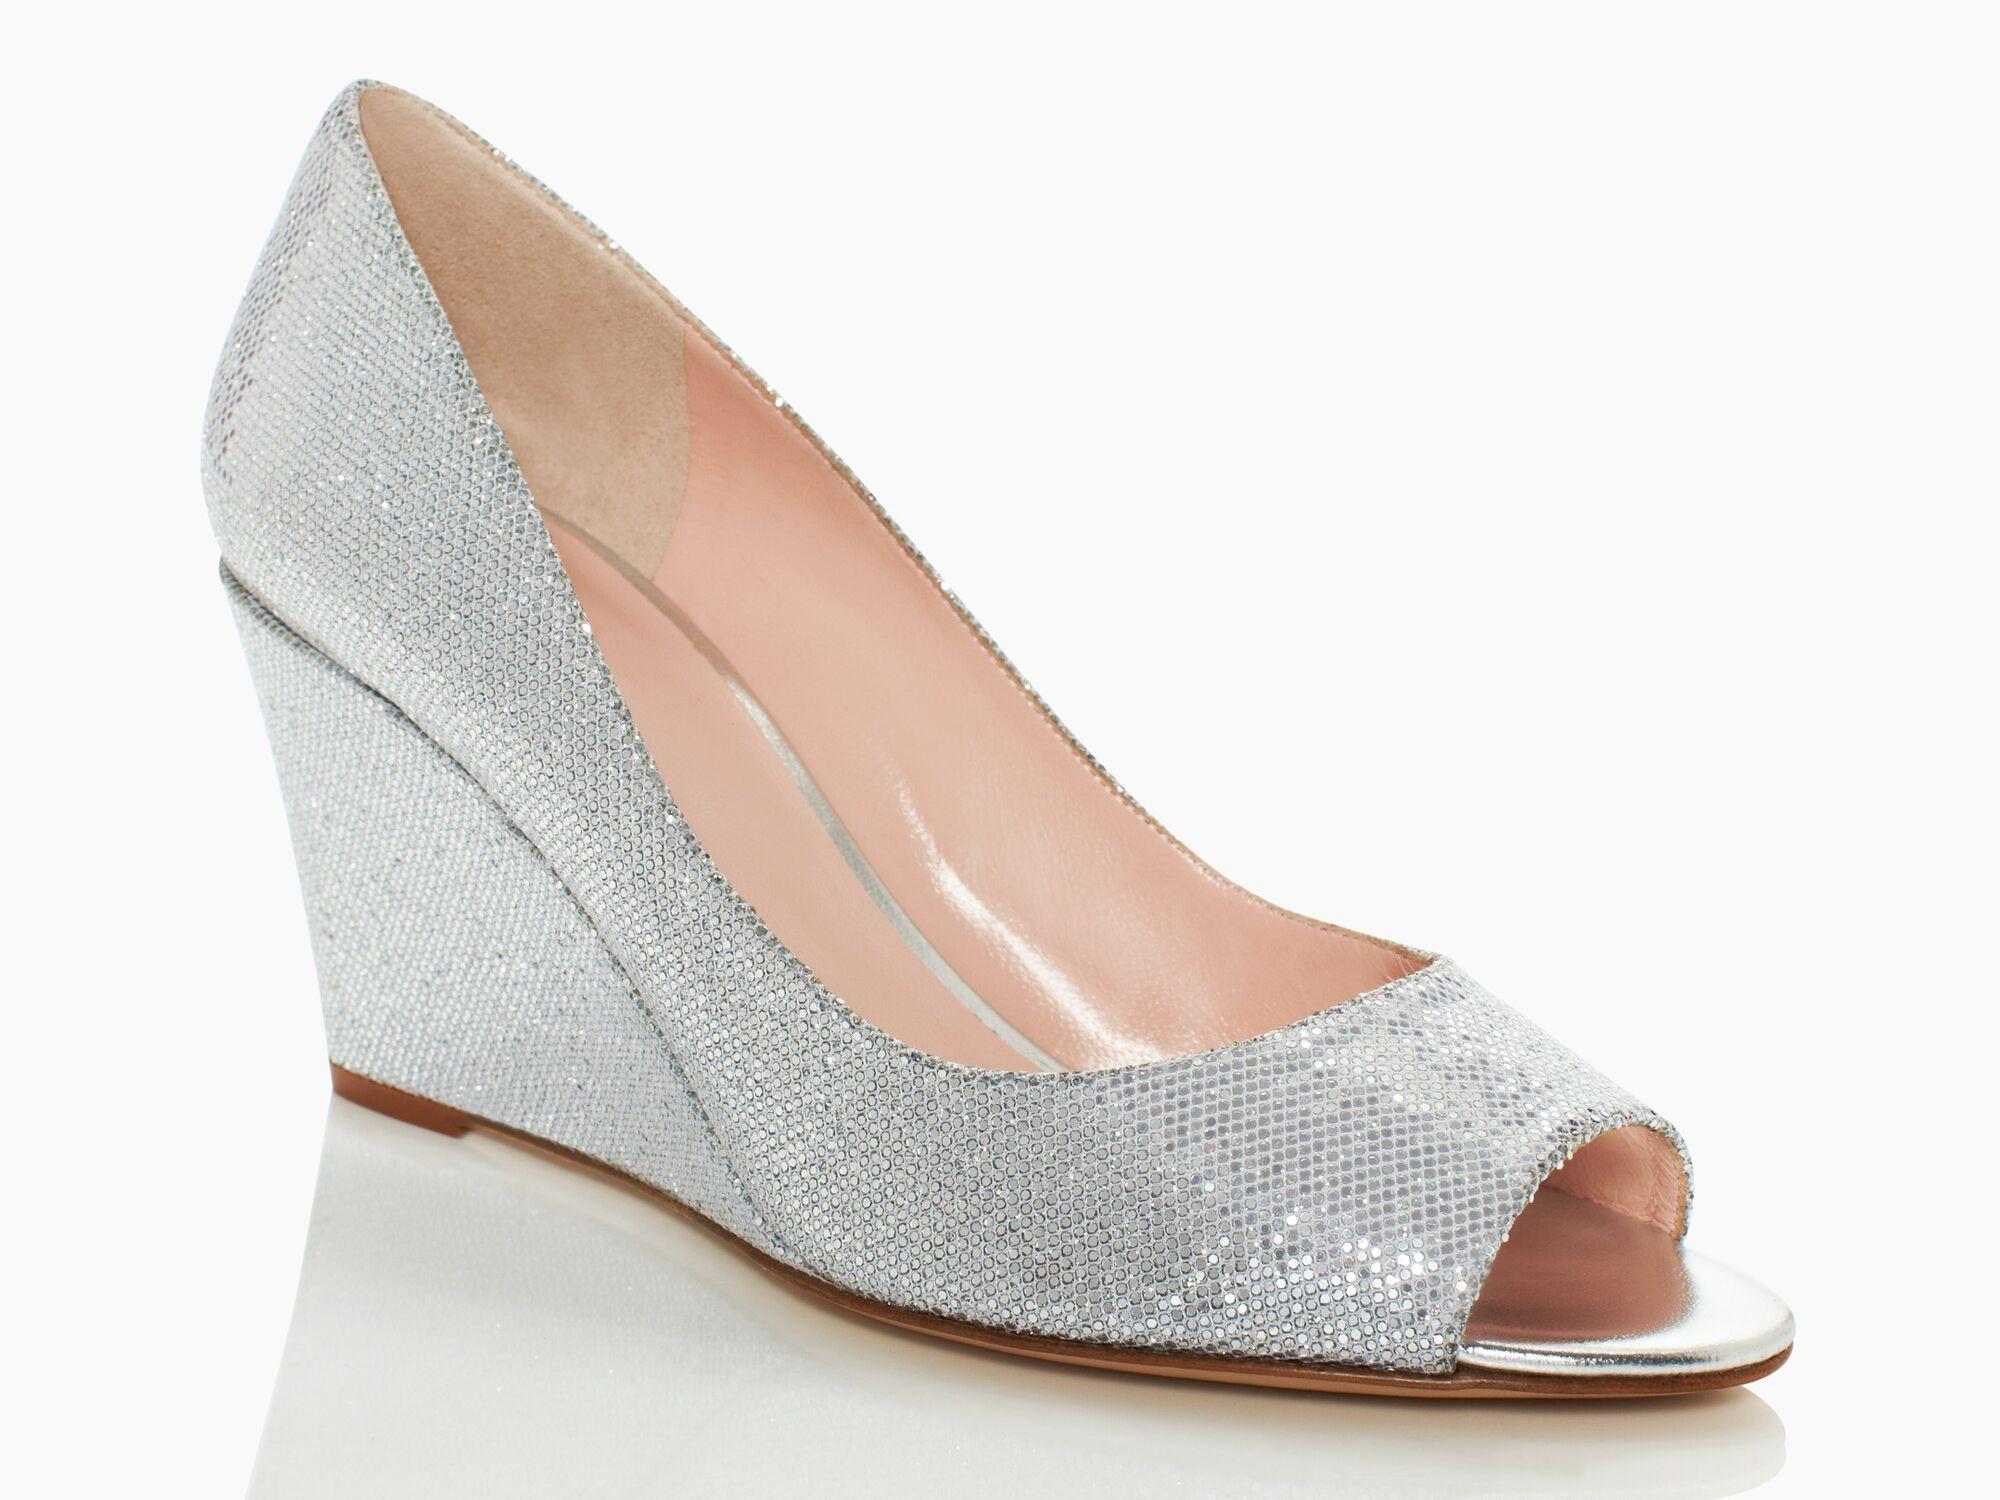 comfortable shoe wedges wedge b most cute products sapphire oka emery simone comforter